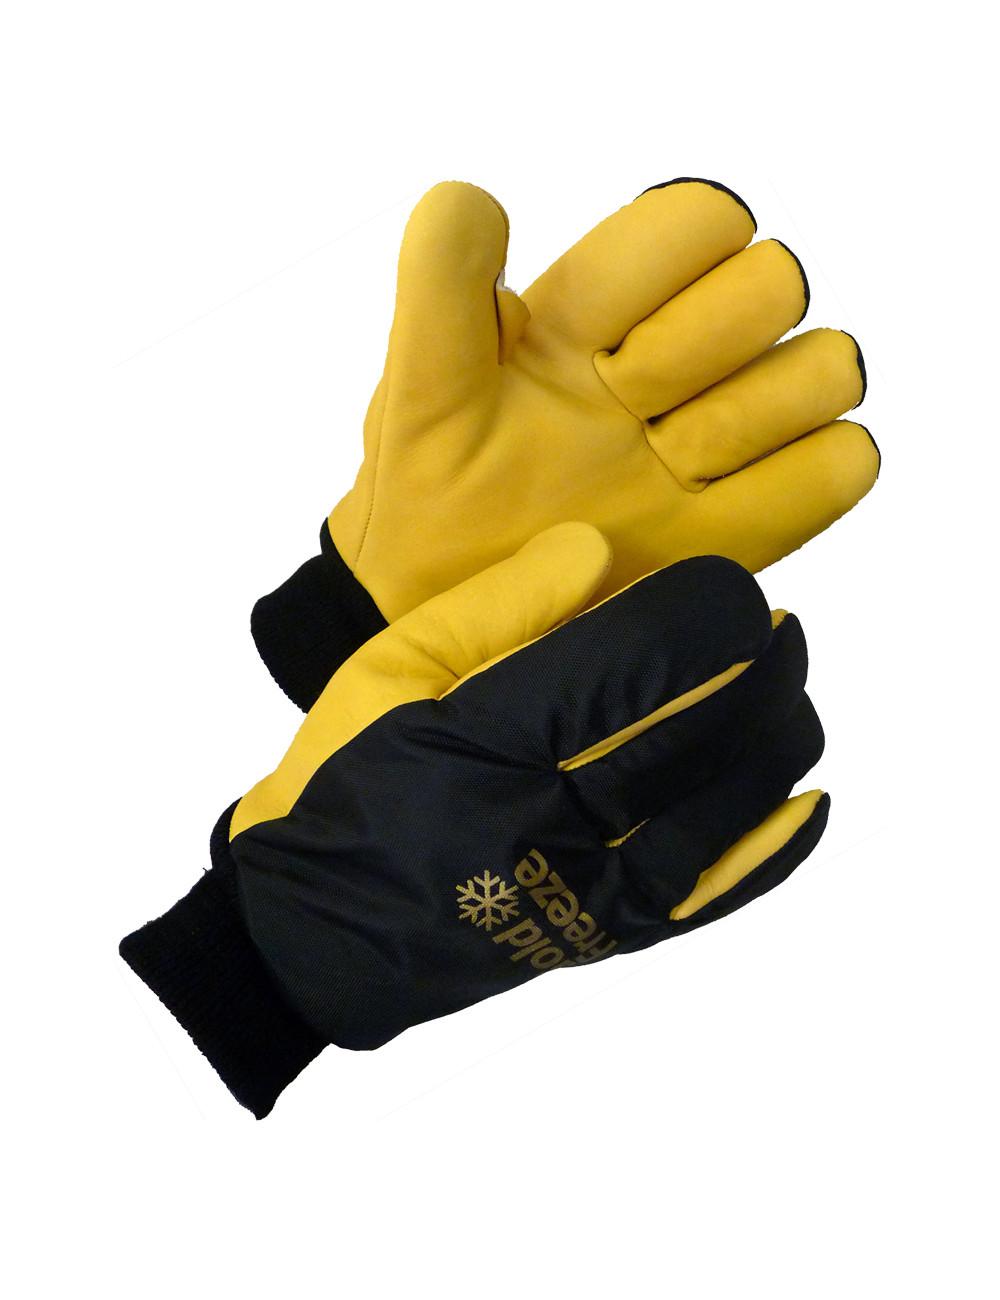 Polar Range Coldstore Gloves